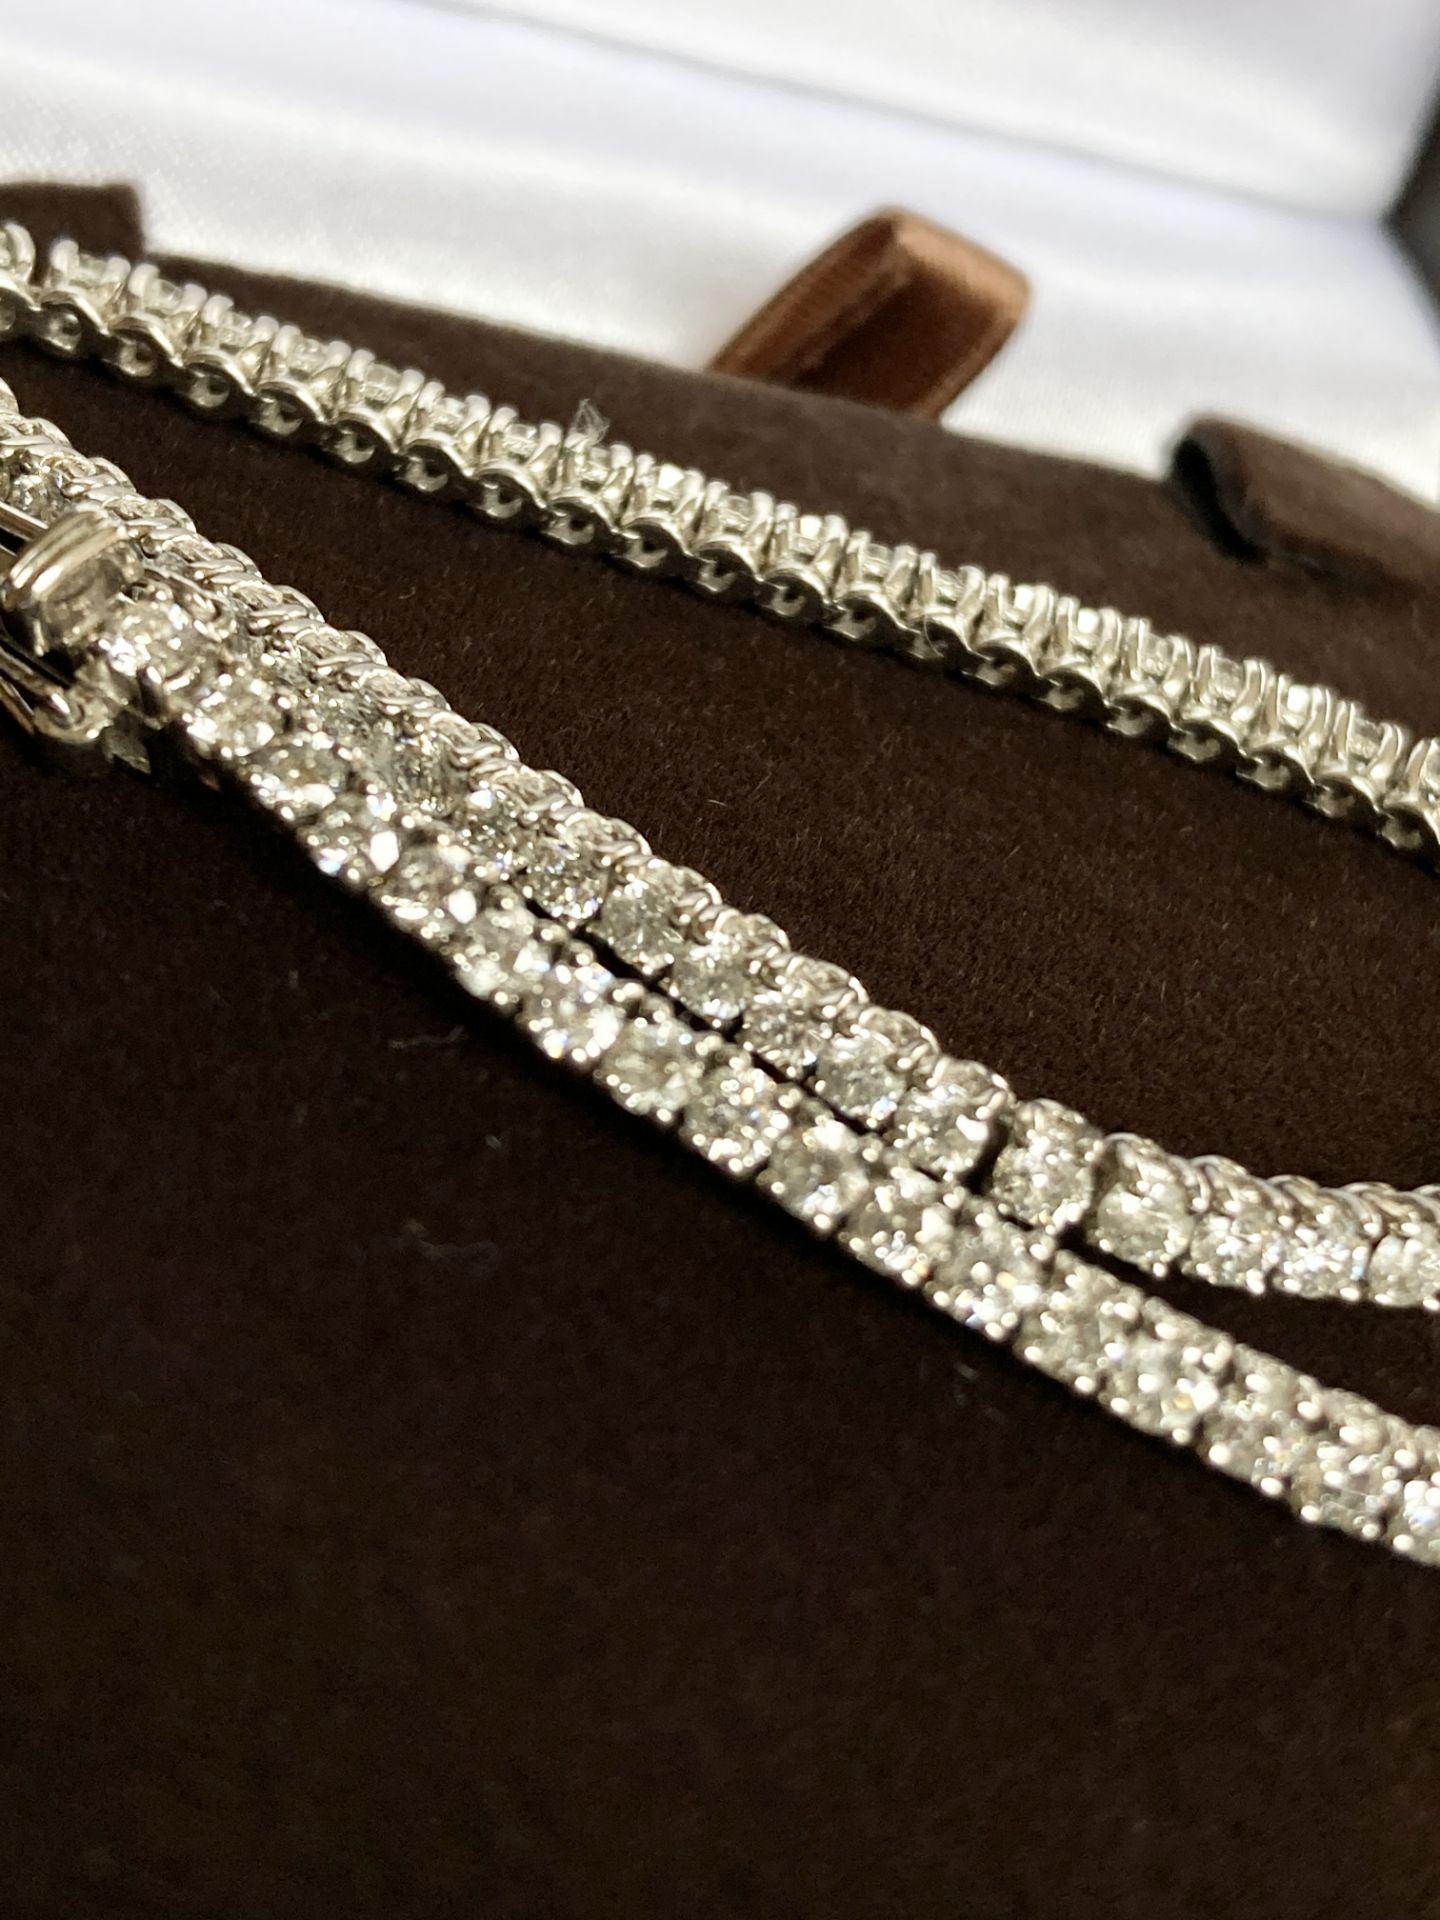 18CT WHITE GOLD 3.2-3.5CT DIAMOND TENNIS BRACELET - Image 4 of 7